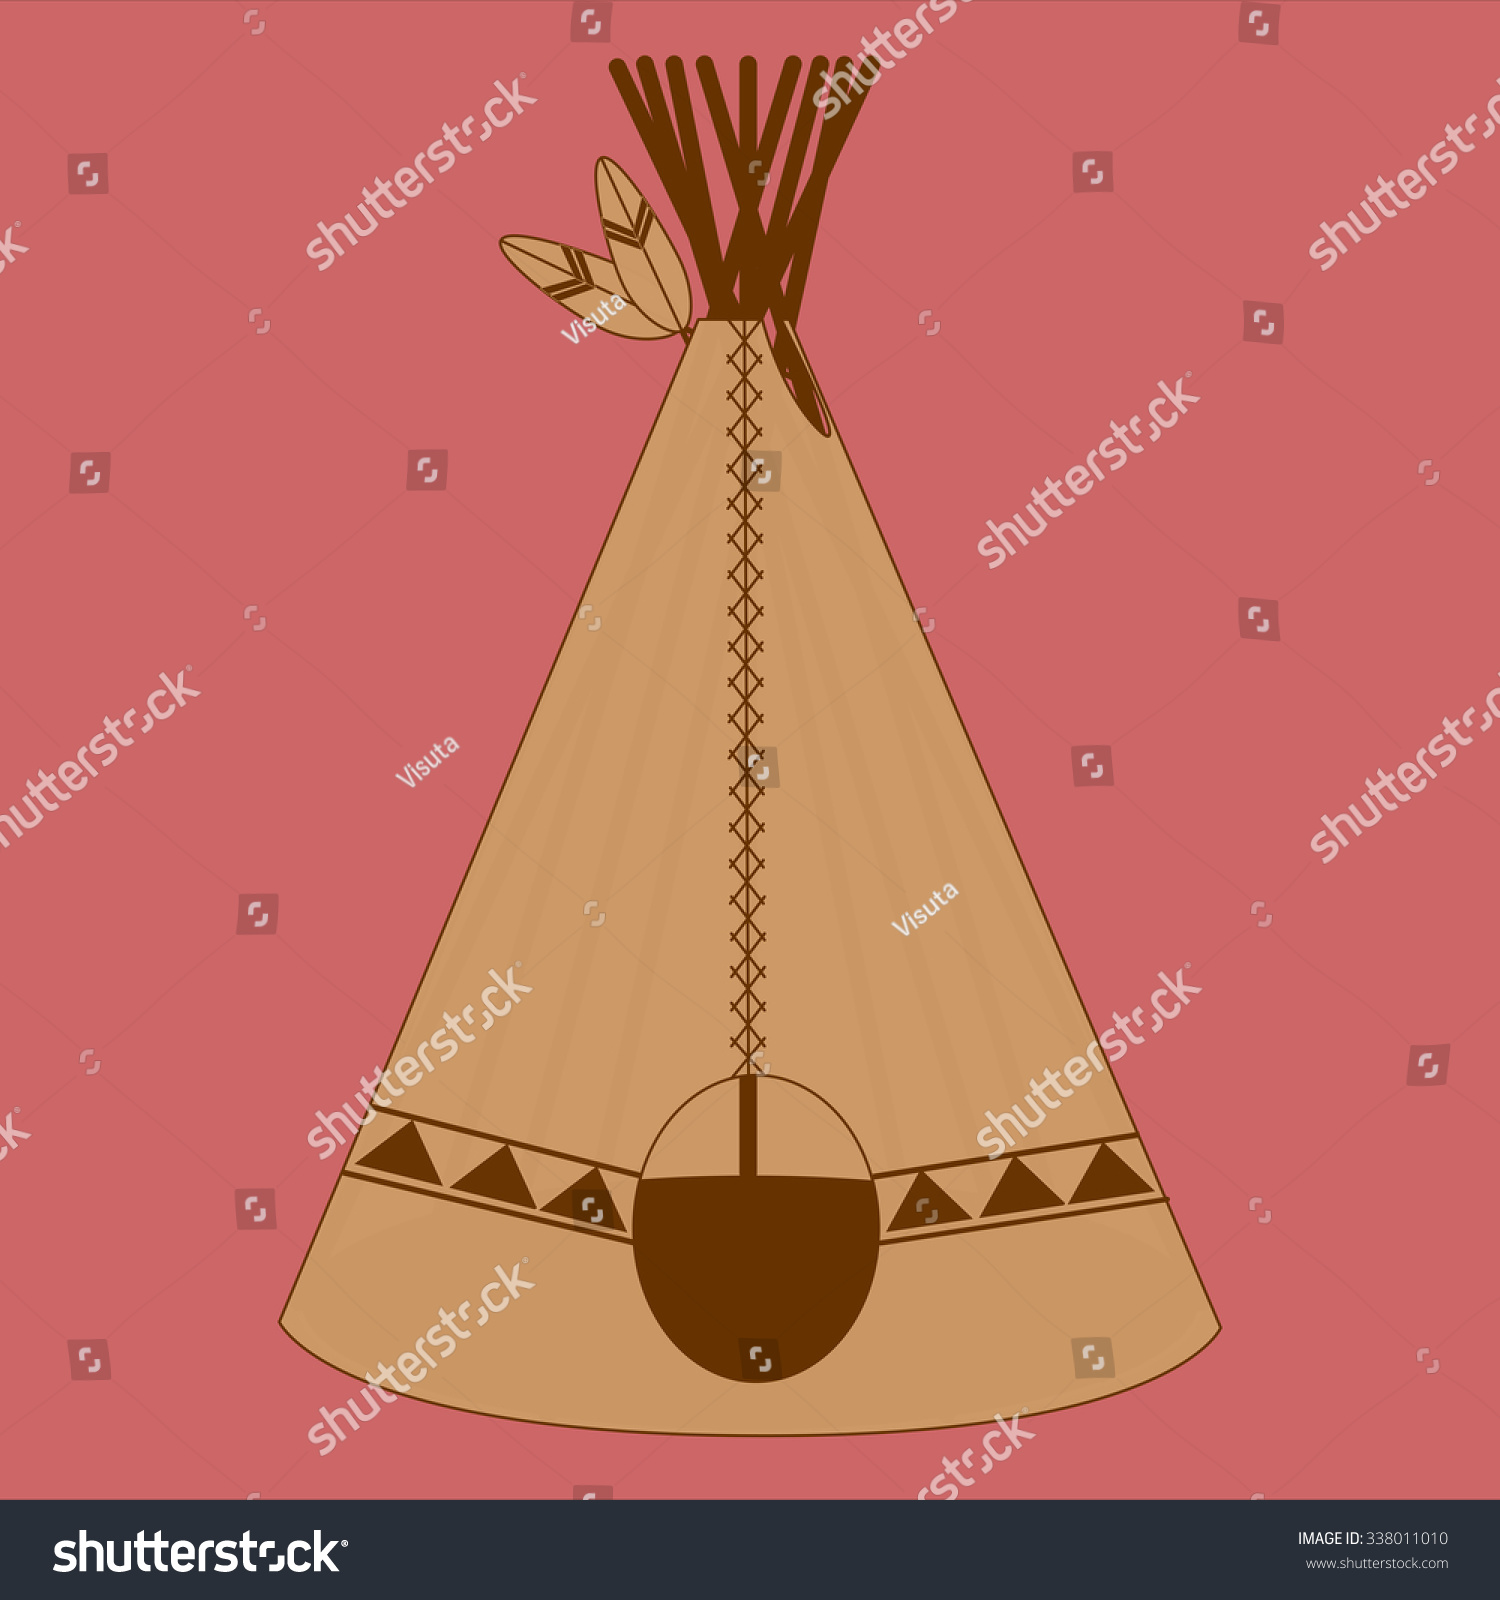 Indians Tent  sc 1 st  Shutterstock & Indians Tent Stock Illustration 338011010 - Shutterstock